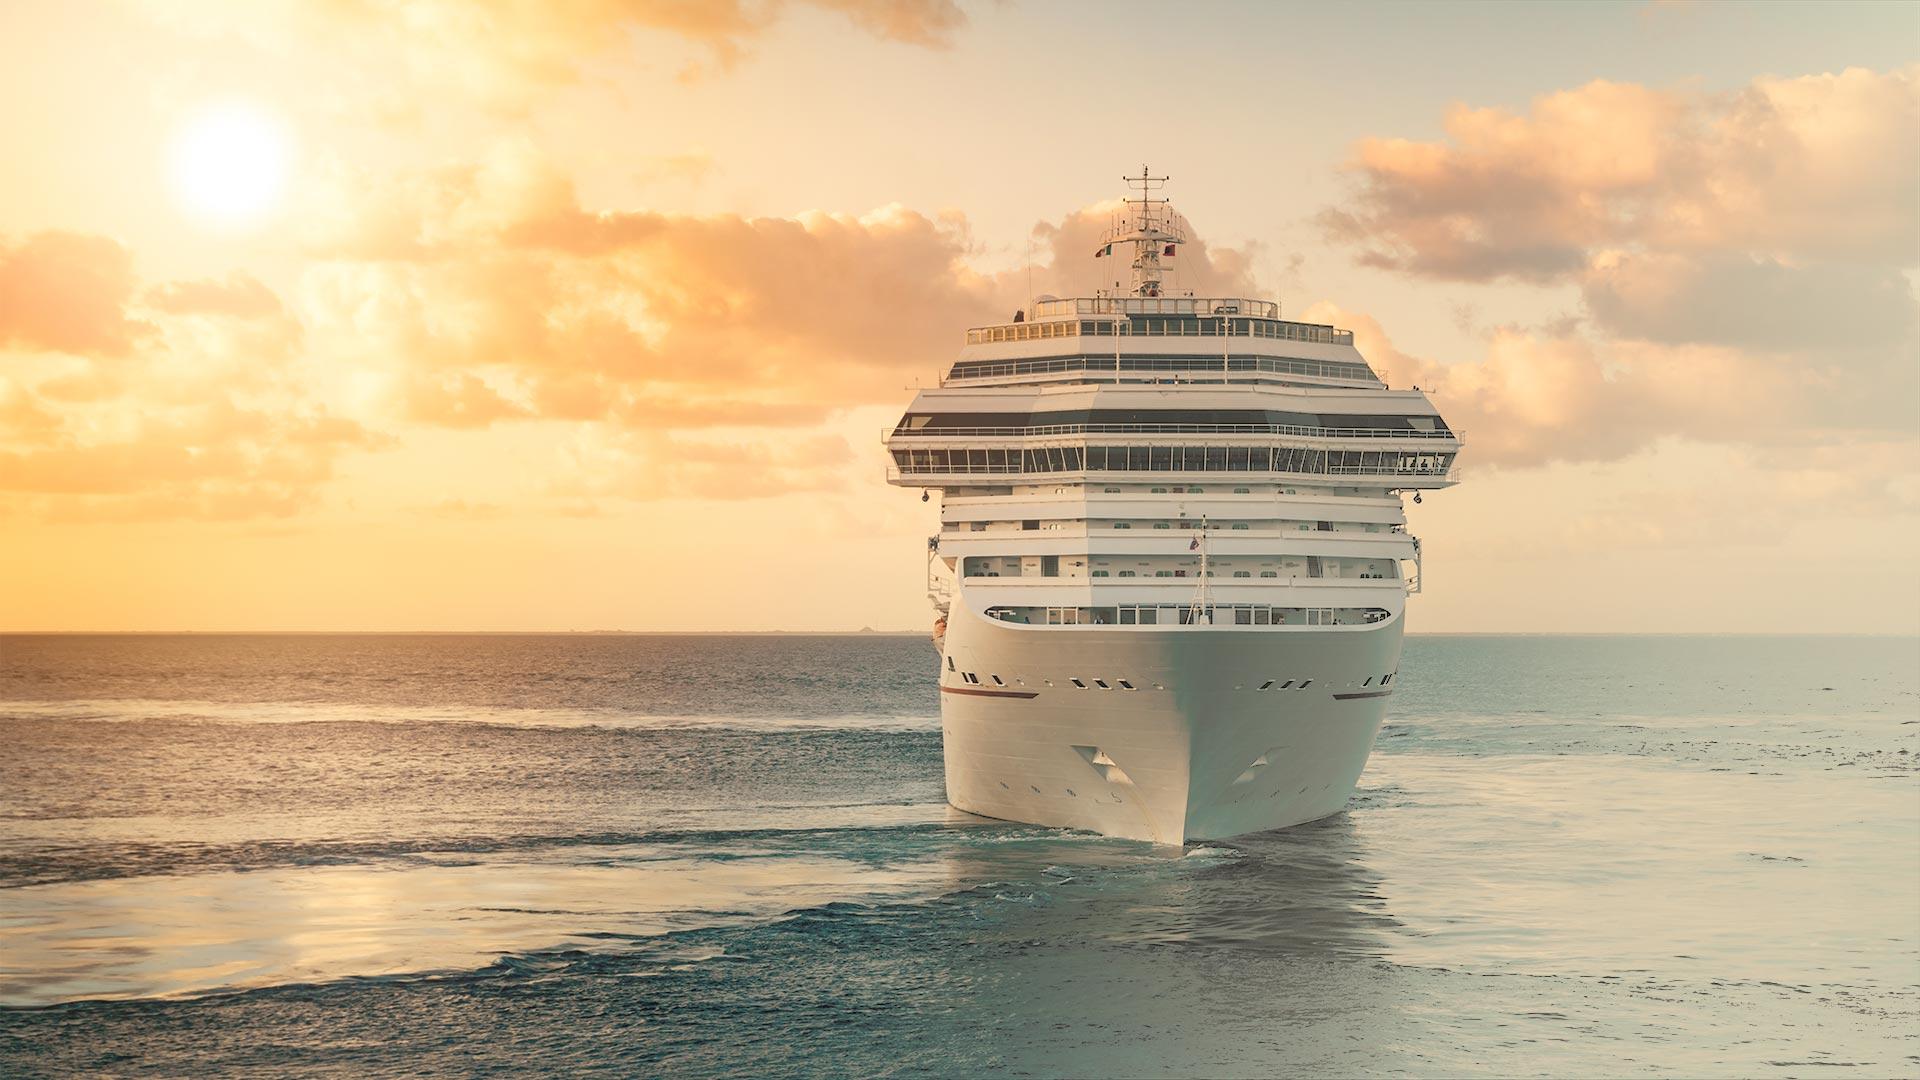 A cruise ship at sea